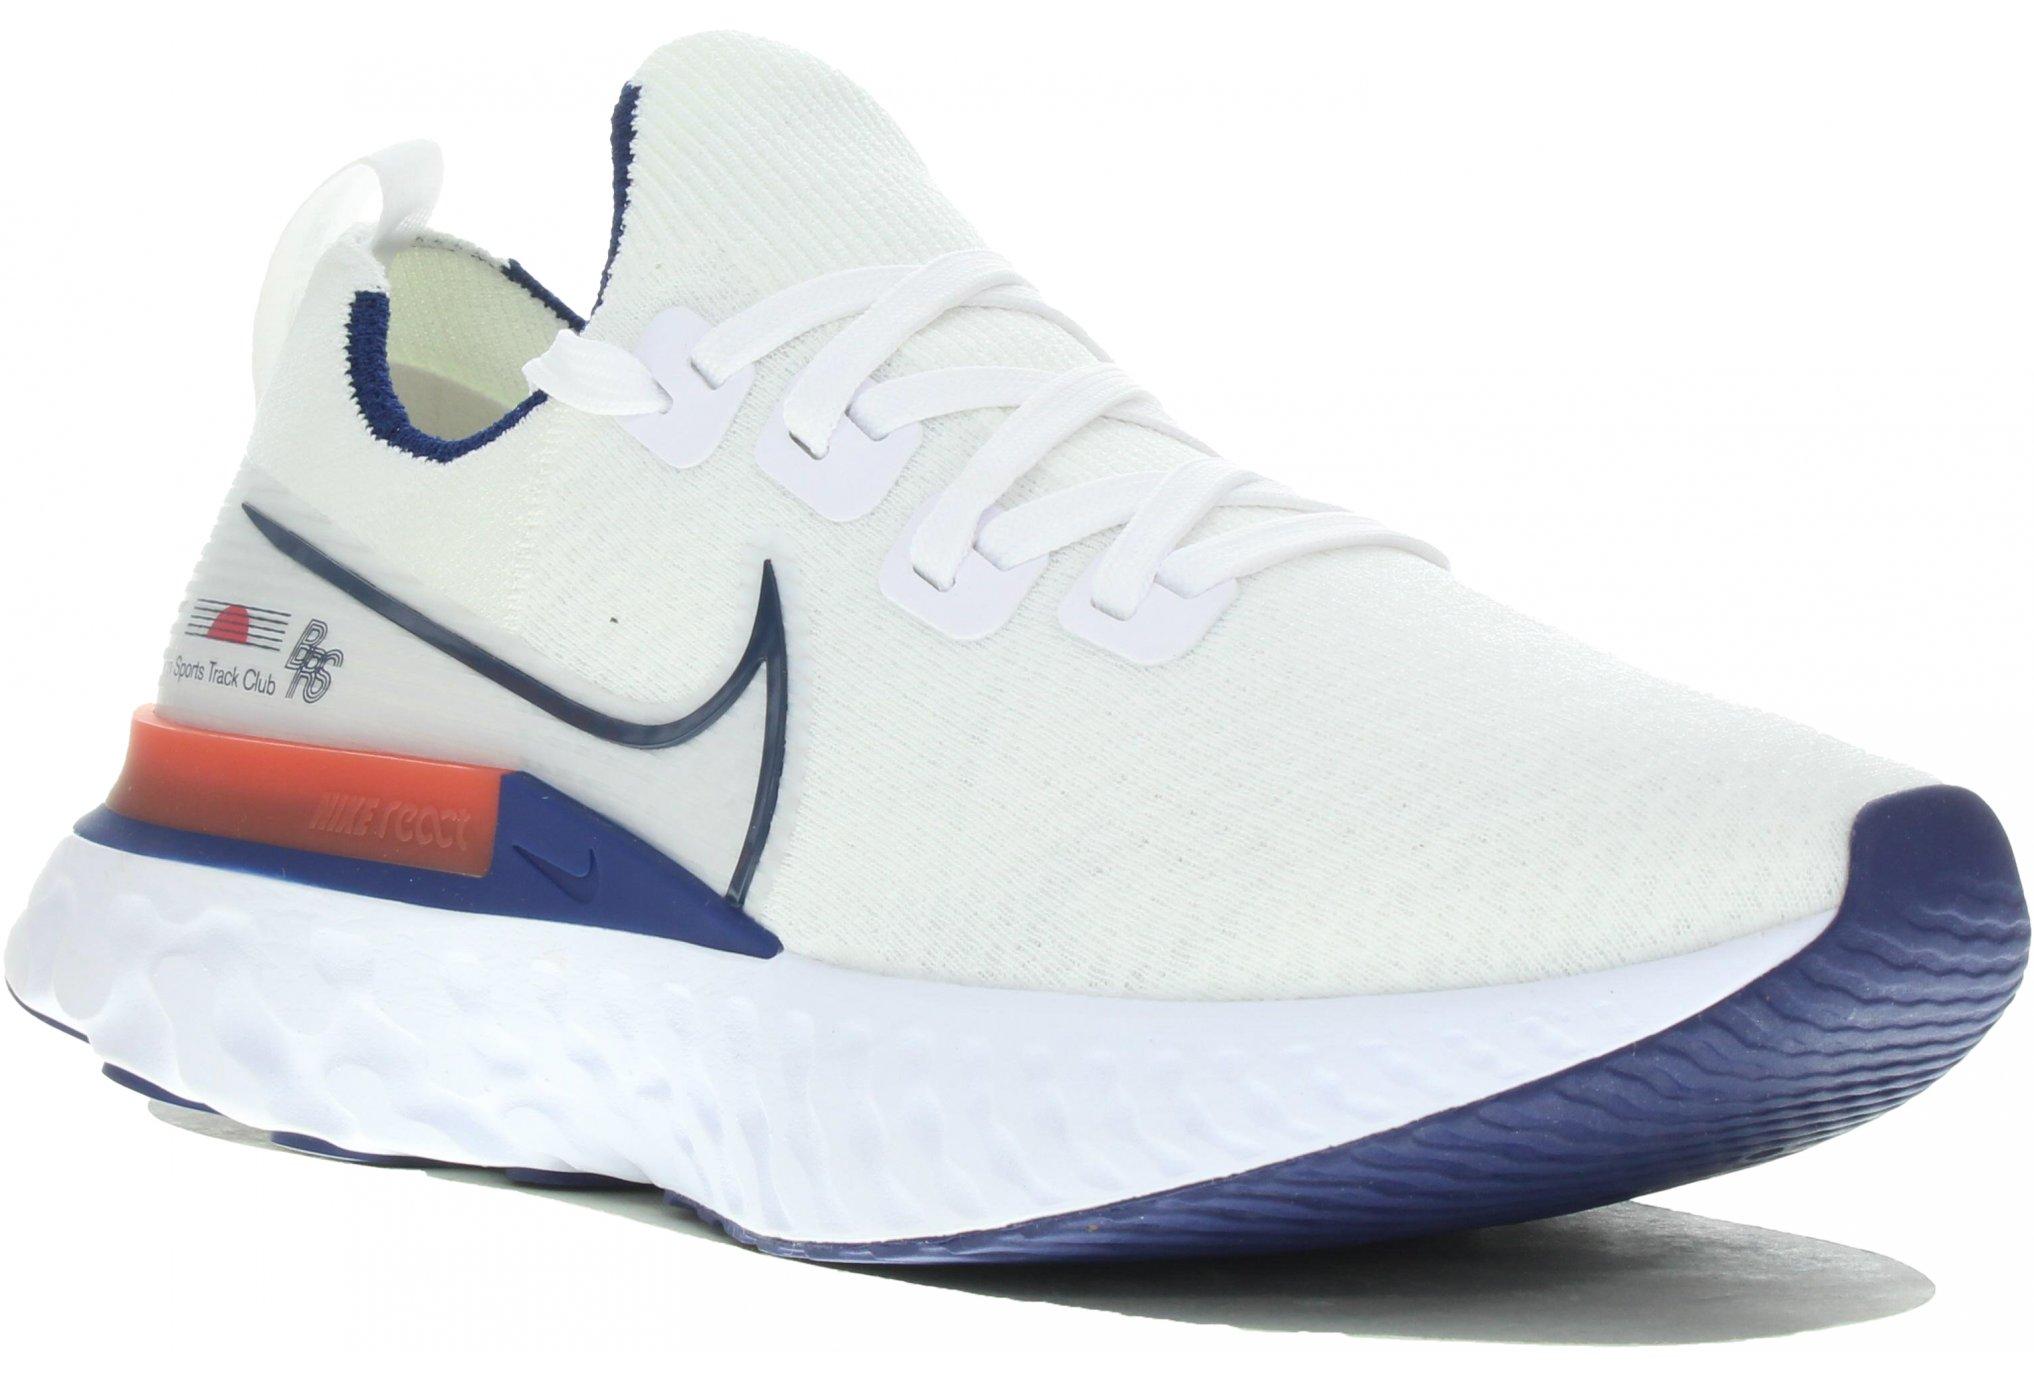 Nike React Infinity Run Flyknit BRS M Diététique Chaussures homme